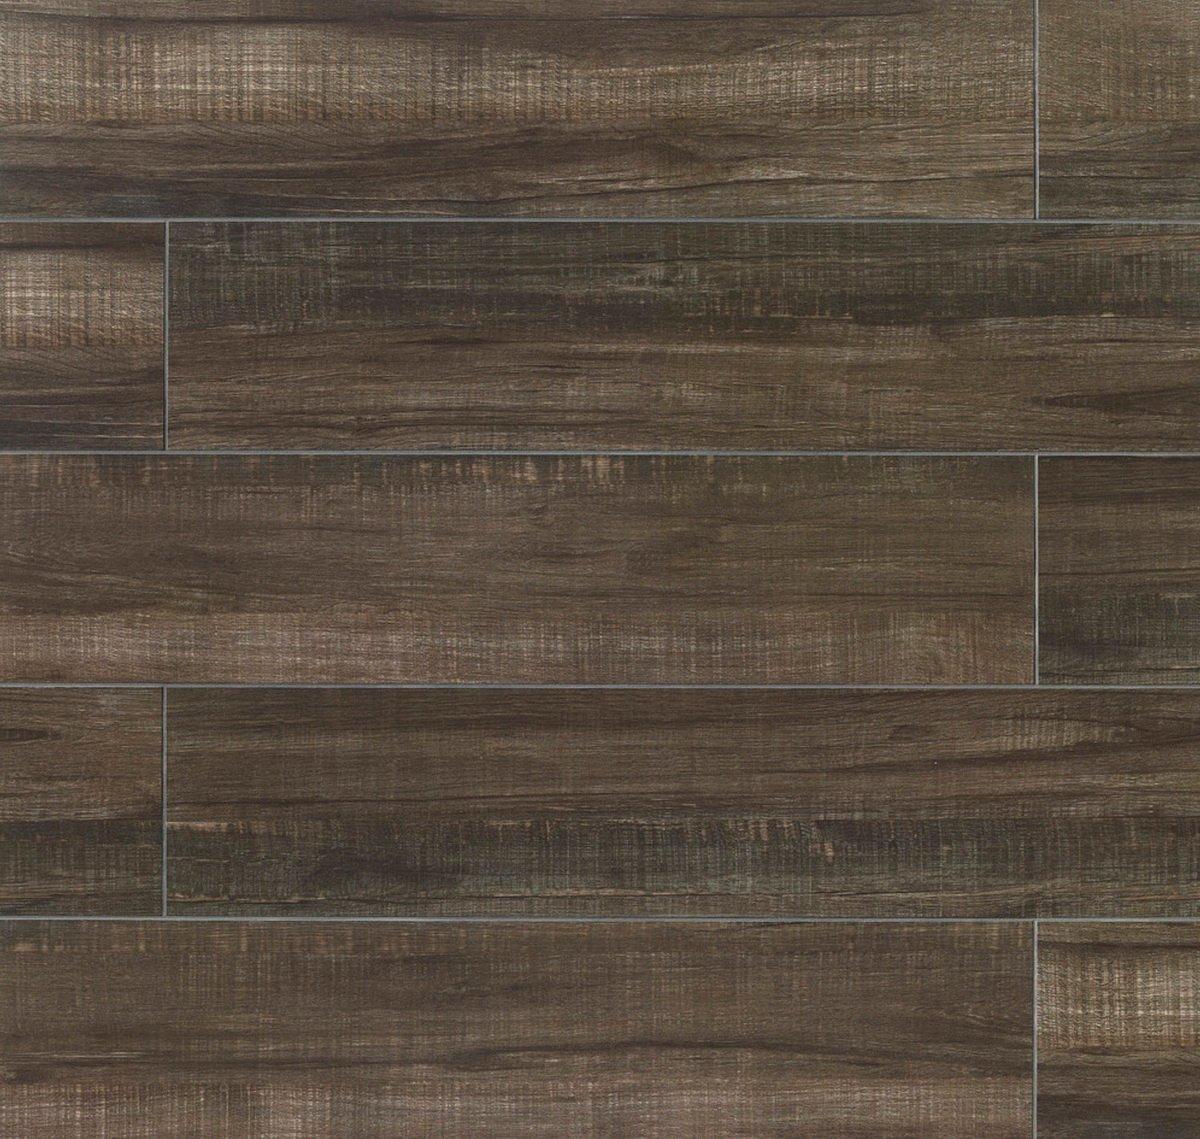 Porcelain wooden living room tiles CCTW29011-15  20X90 15X90 20X1000/8x36'6x36 8x40'